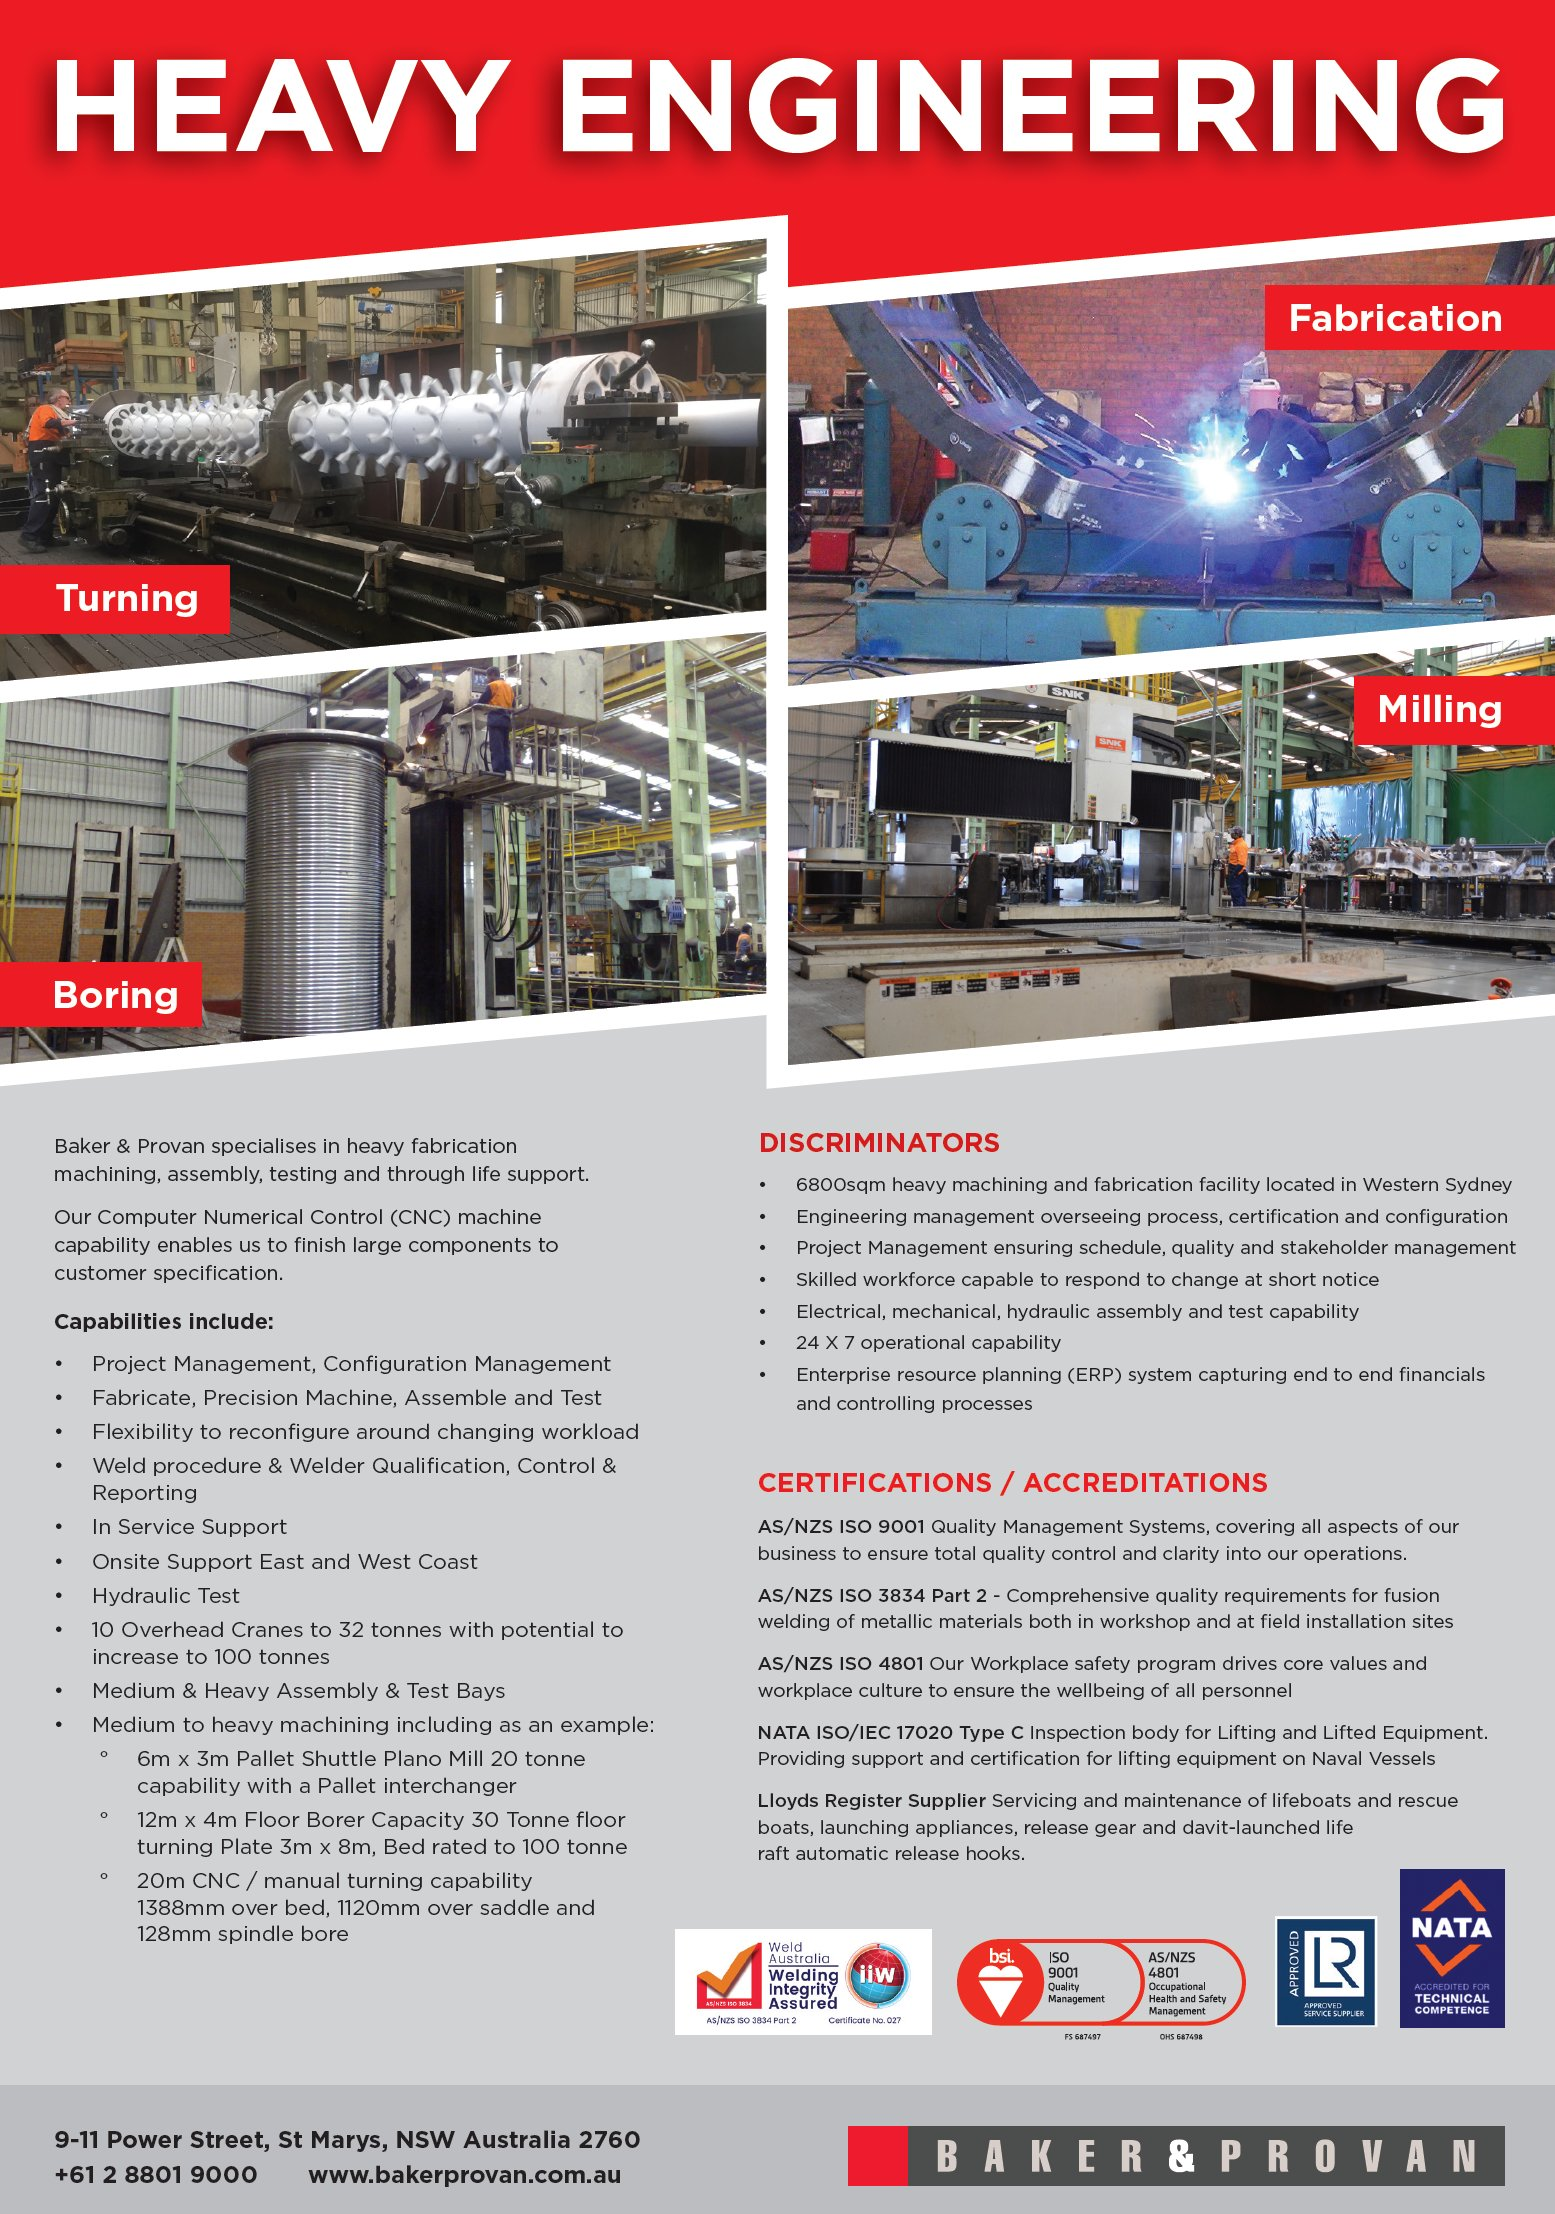 Baker & Provan Heavy Engineering Brochure